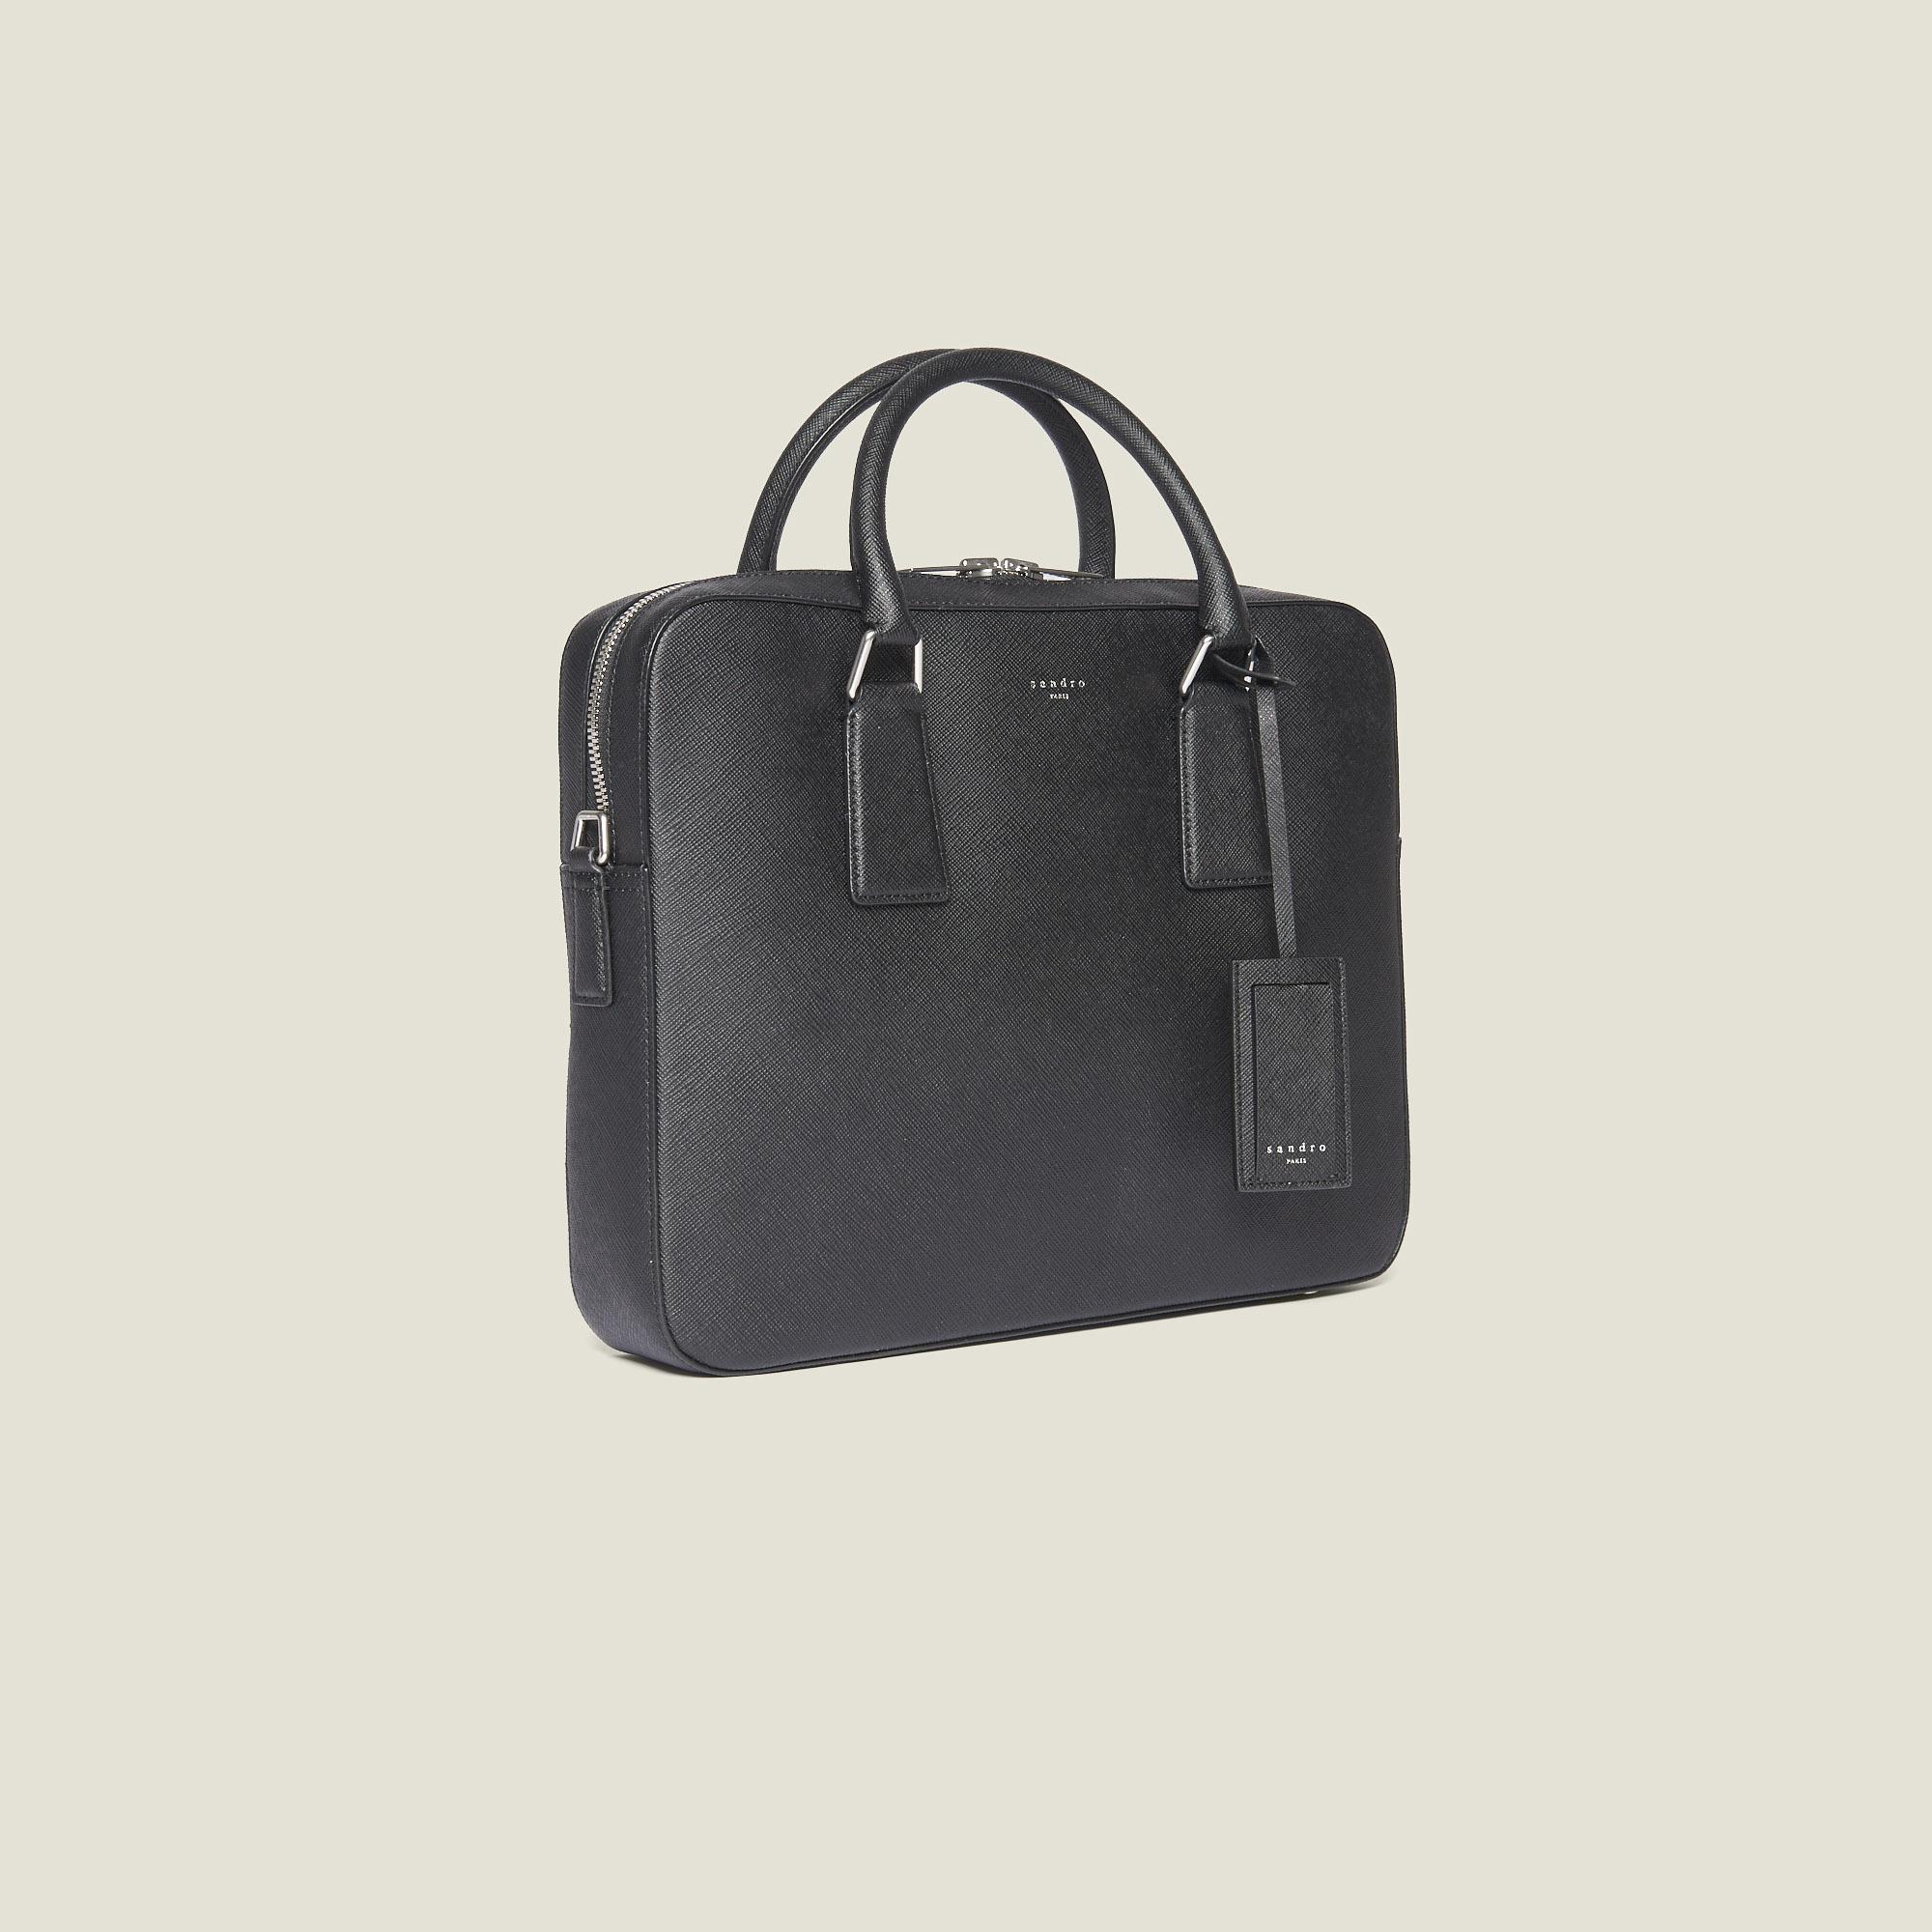 Saffiano Leather Briefcase Bags Sandro Paris